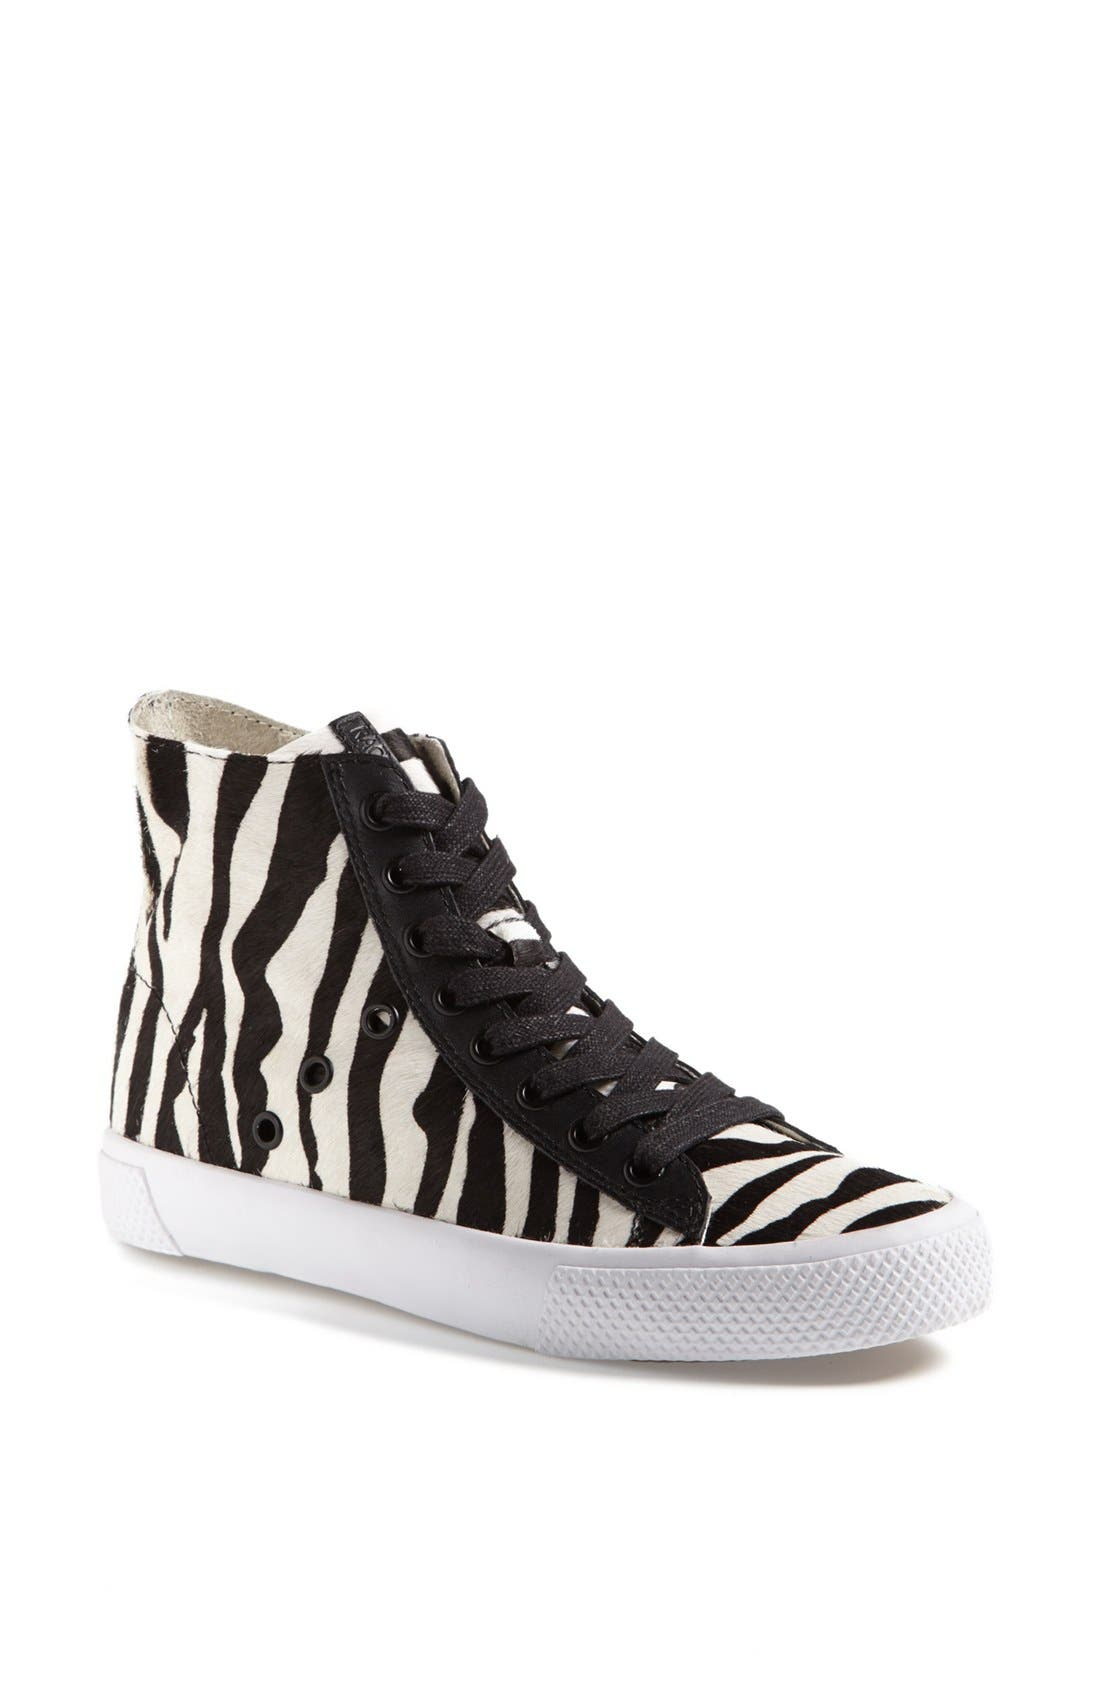 Main Image - Rachel Zoe 'Barret' Zebra Print Calf Hair Sneaker (Online Only)